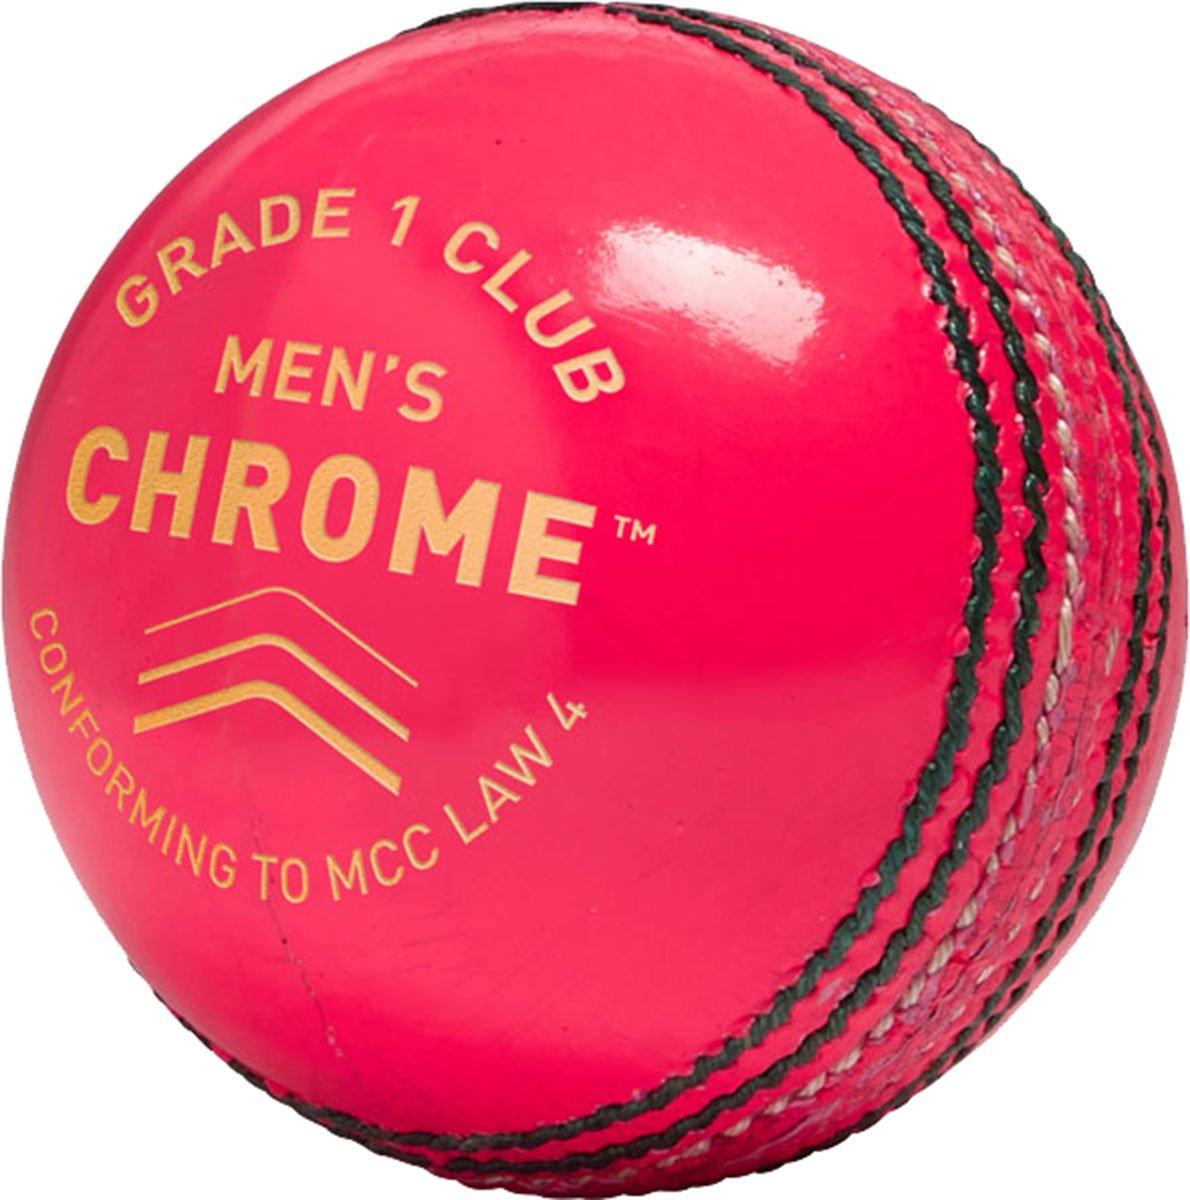 Onlyglobal Gunn /& Moore Cricket Chrome Grade 1 Club Ball English Leather Senior